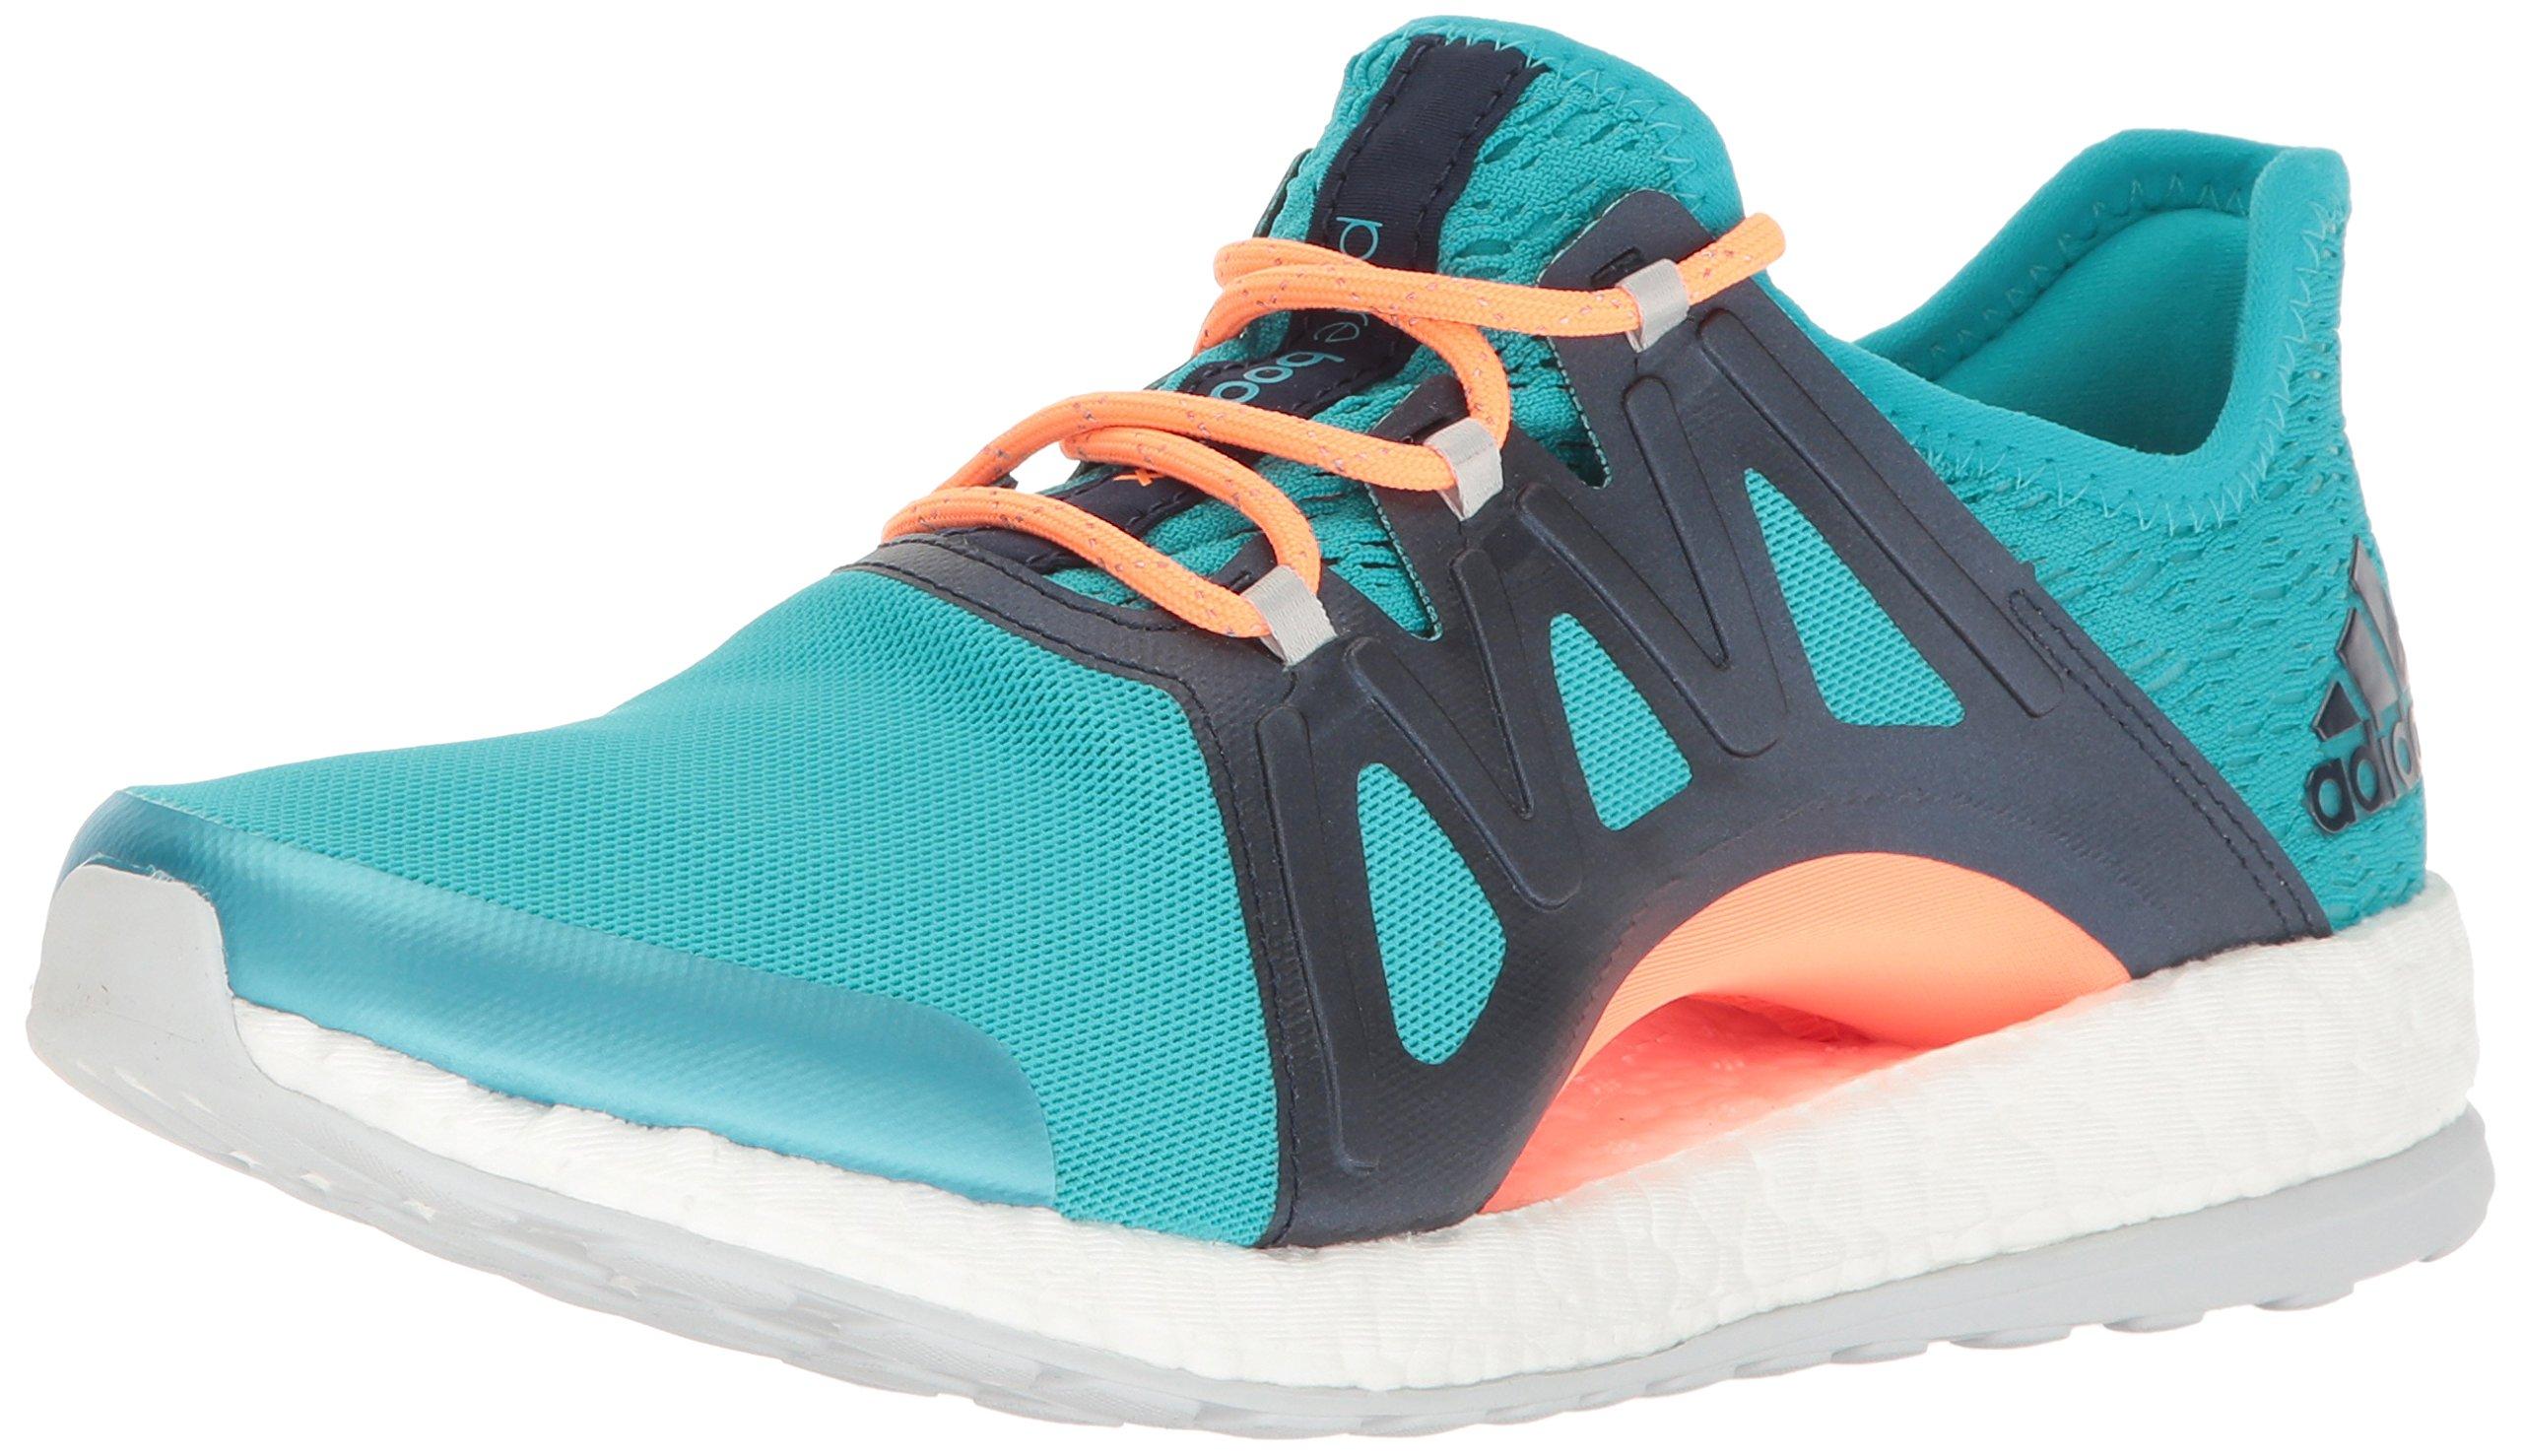 37a3f074e Galleon - Adidas Women s Pureboost Xpose Clima Running Shoe